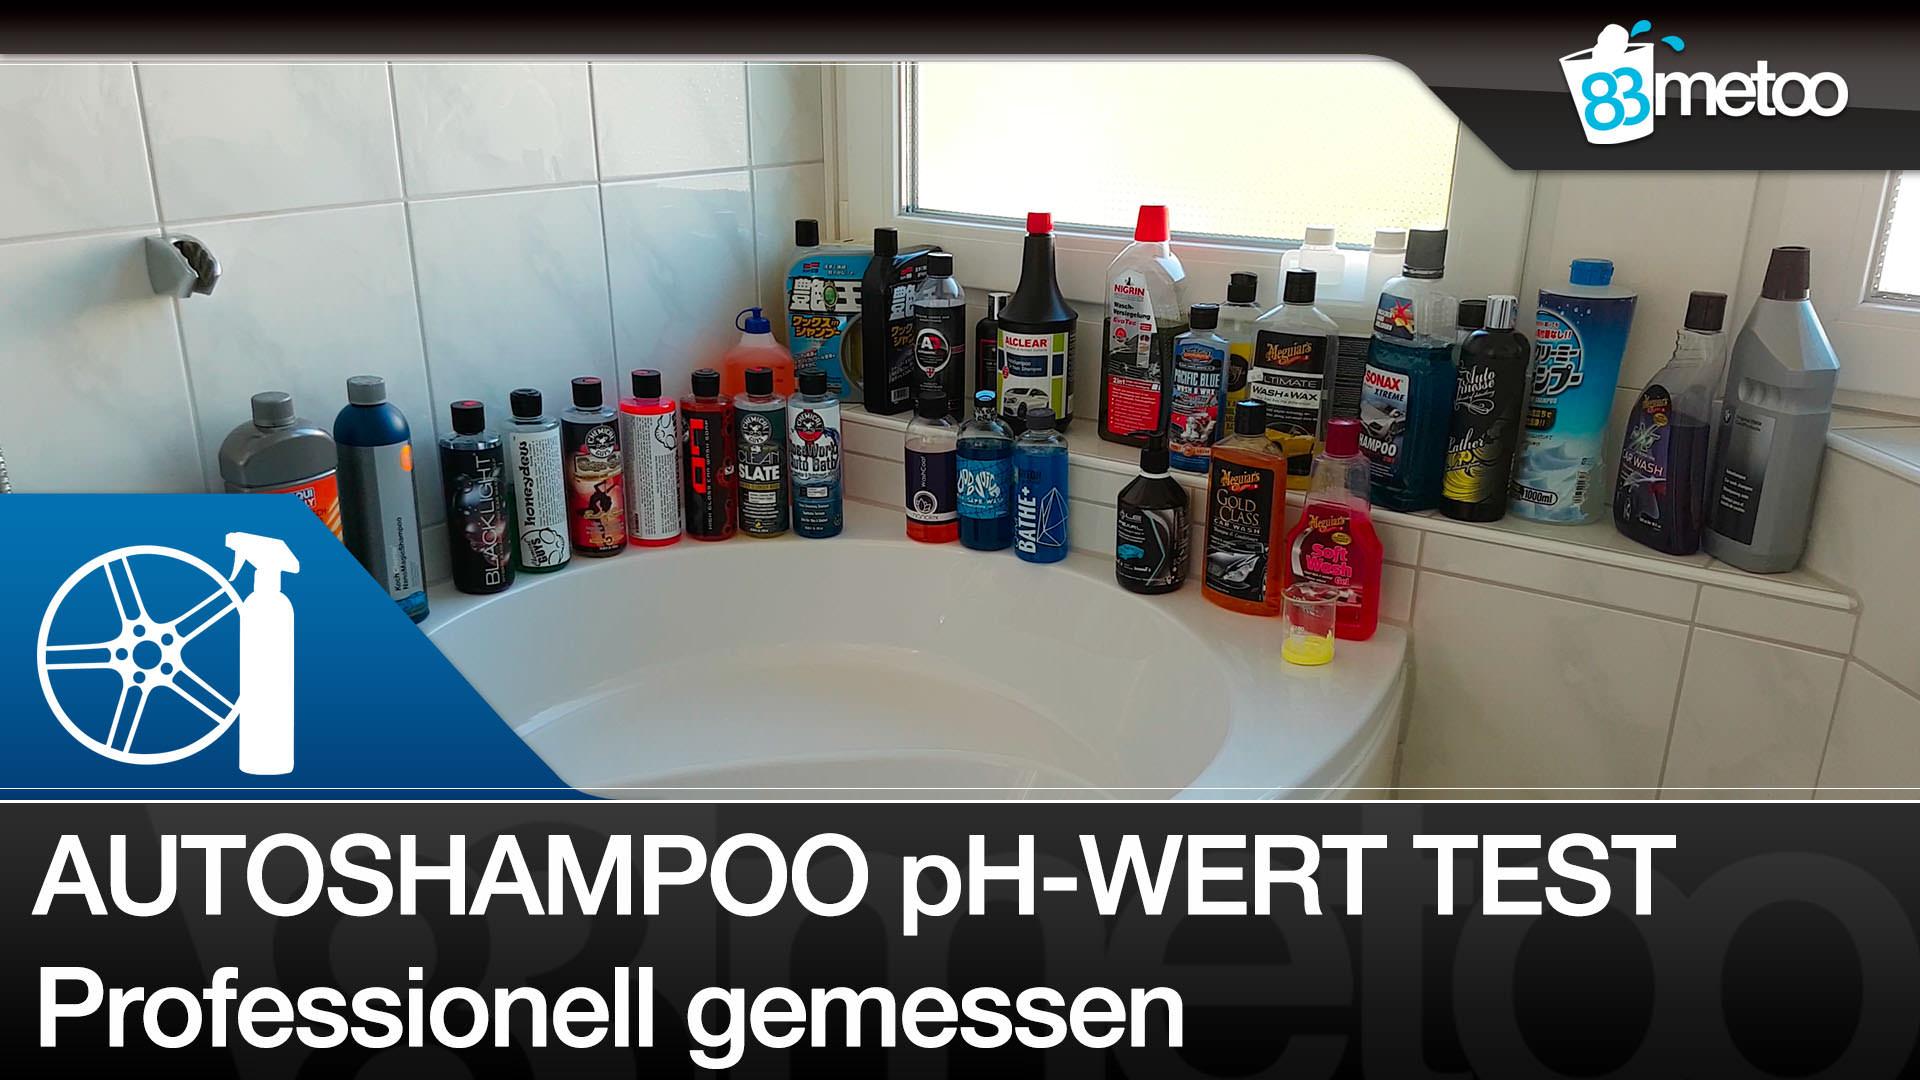 Autoshampoo pH-Wert